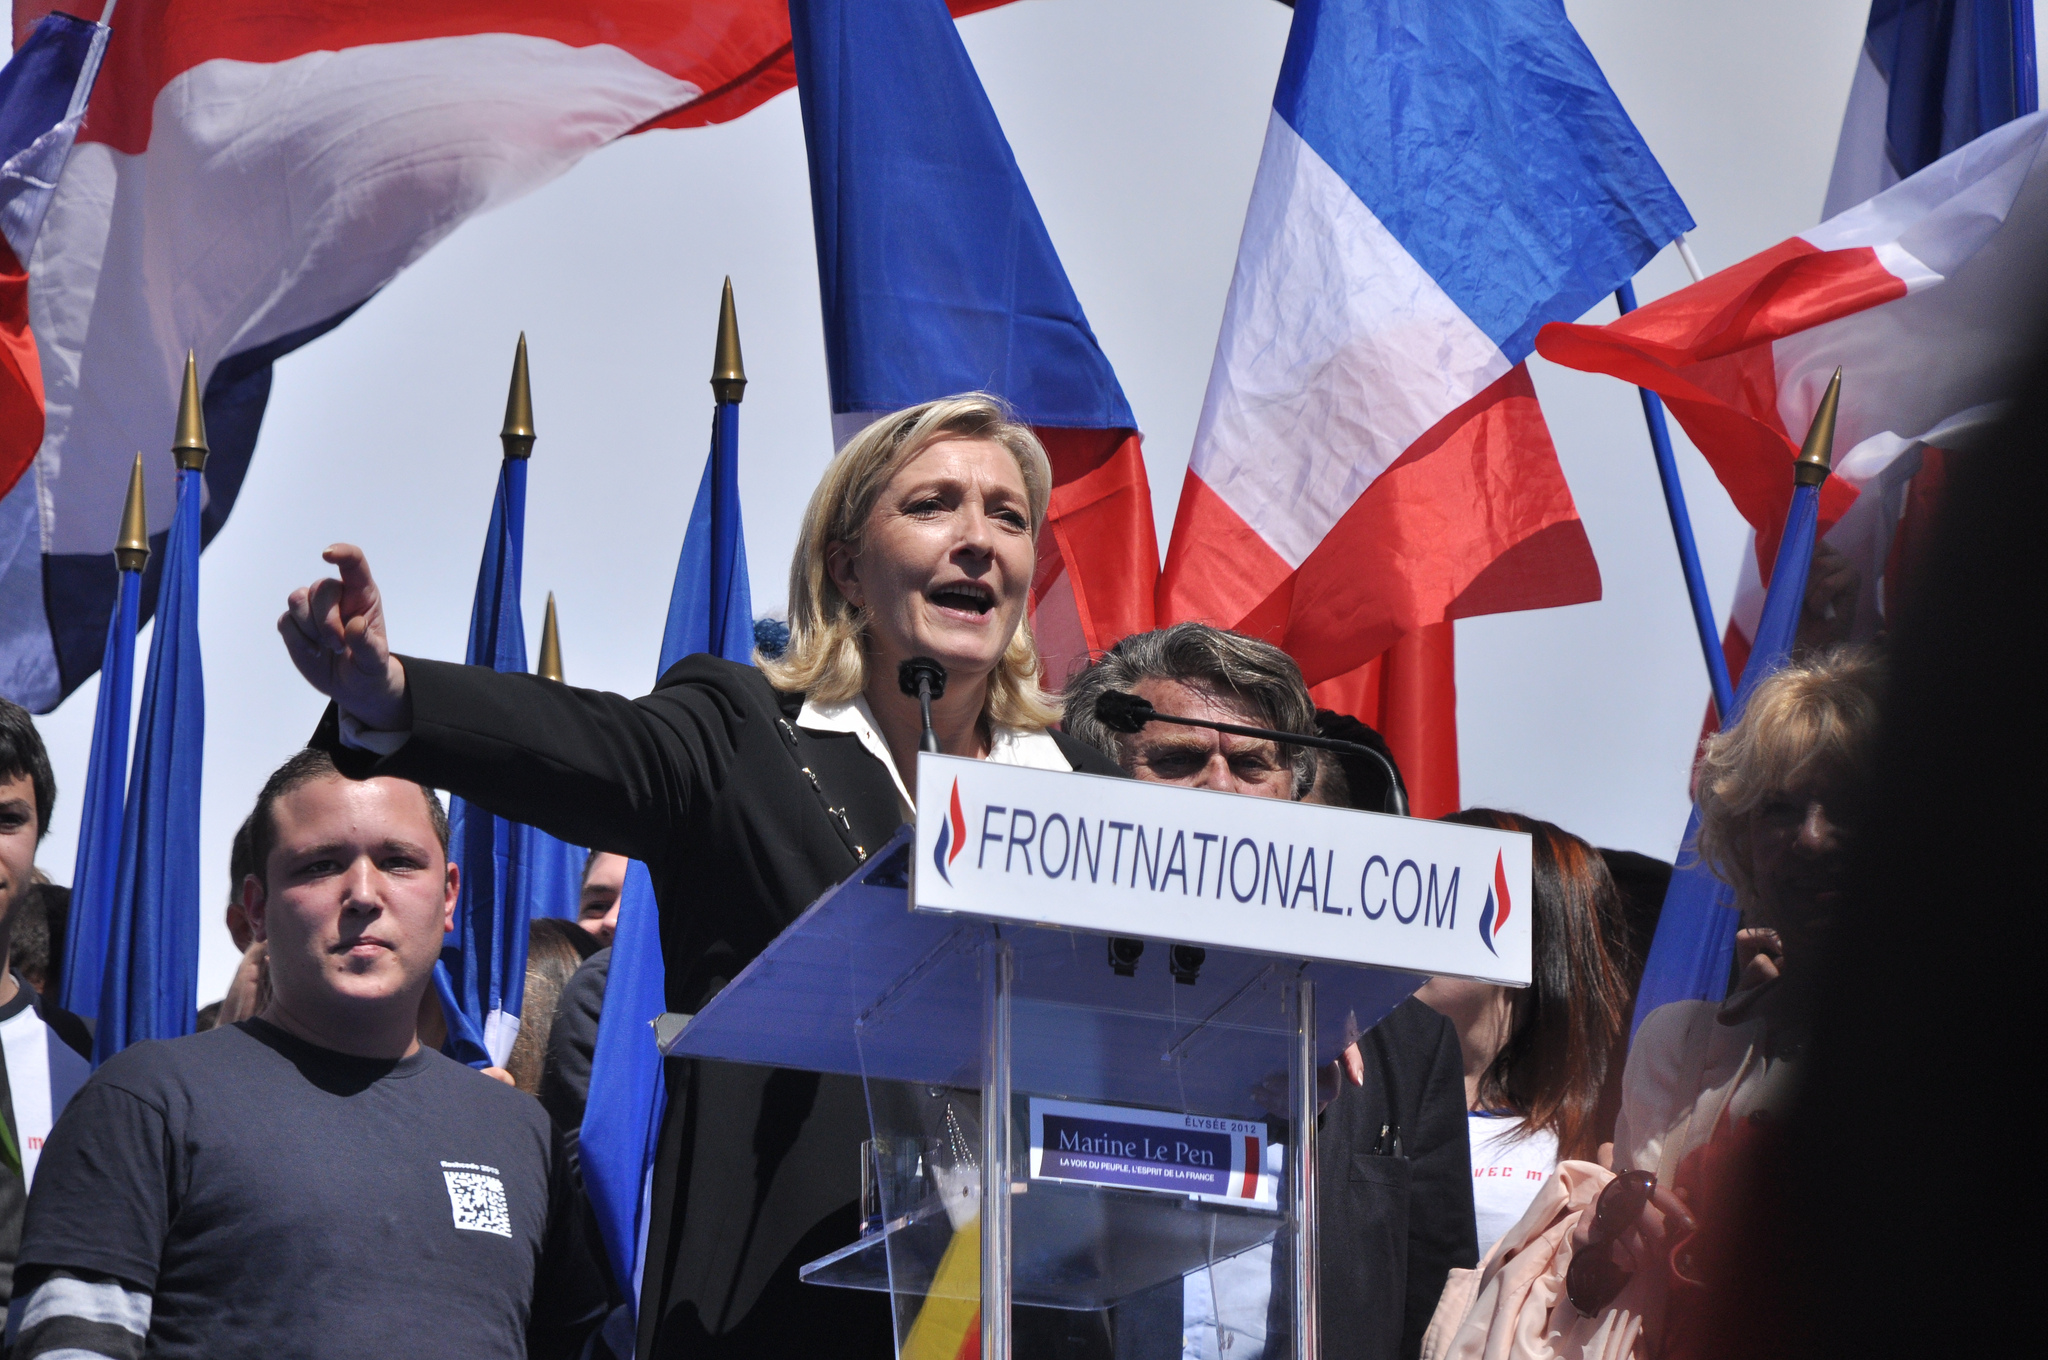 Marine Le Pen (2012)